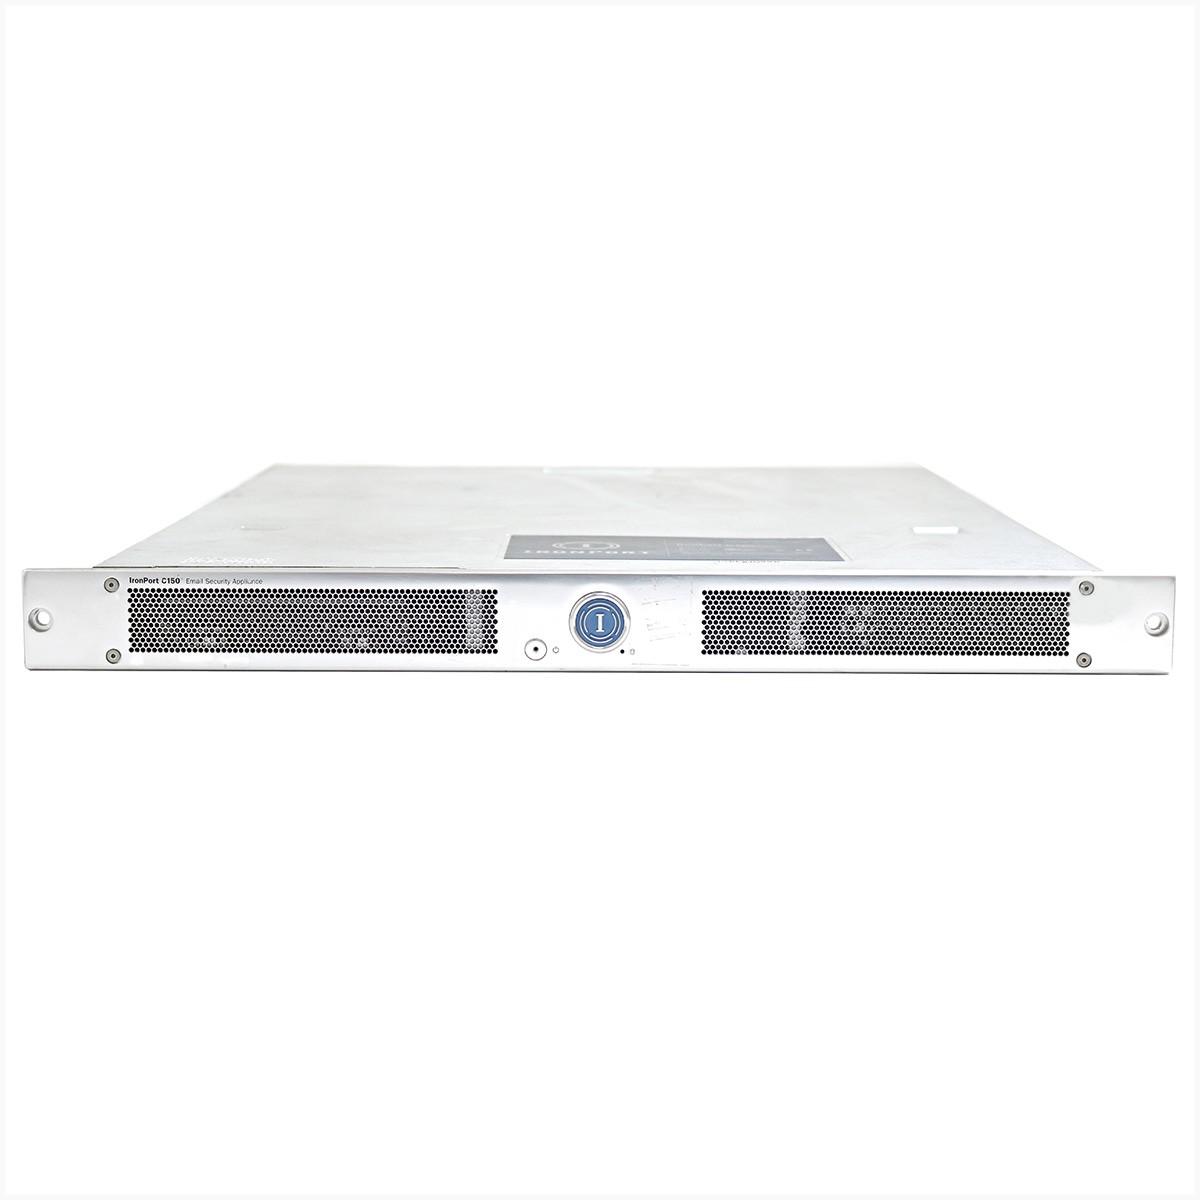 Appliance firewall iron port c150 - usado